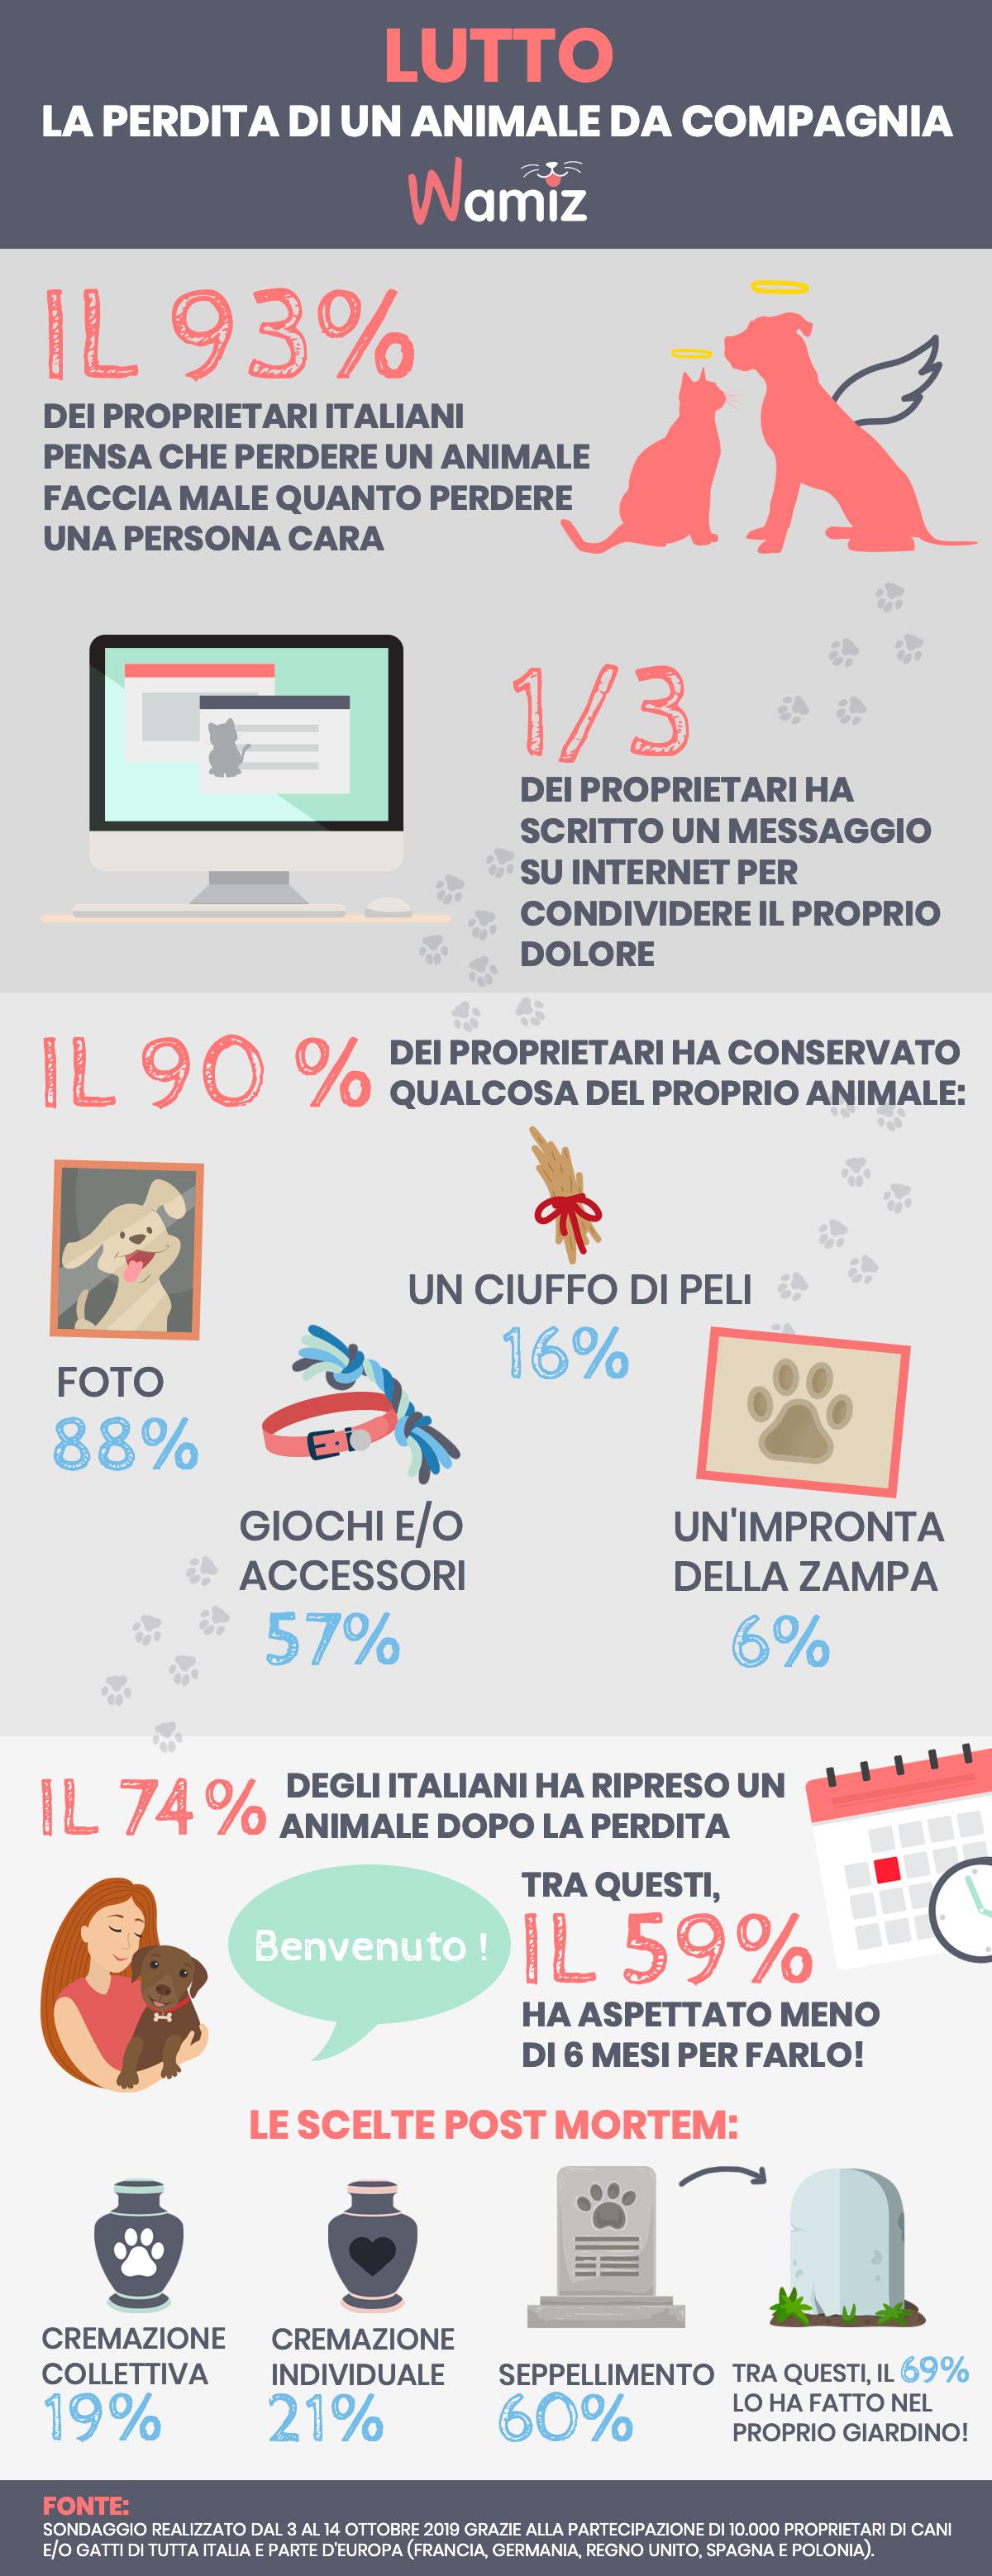 infografica-lutto-sondaggio-wamiz